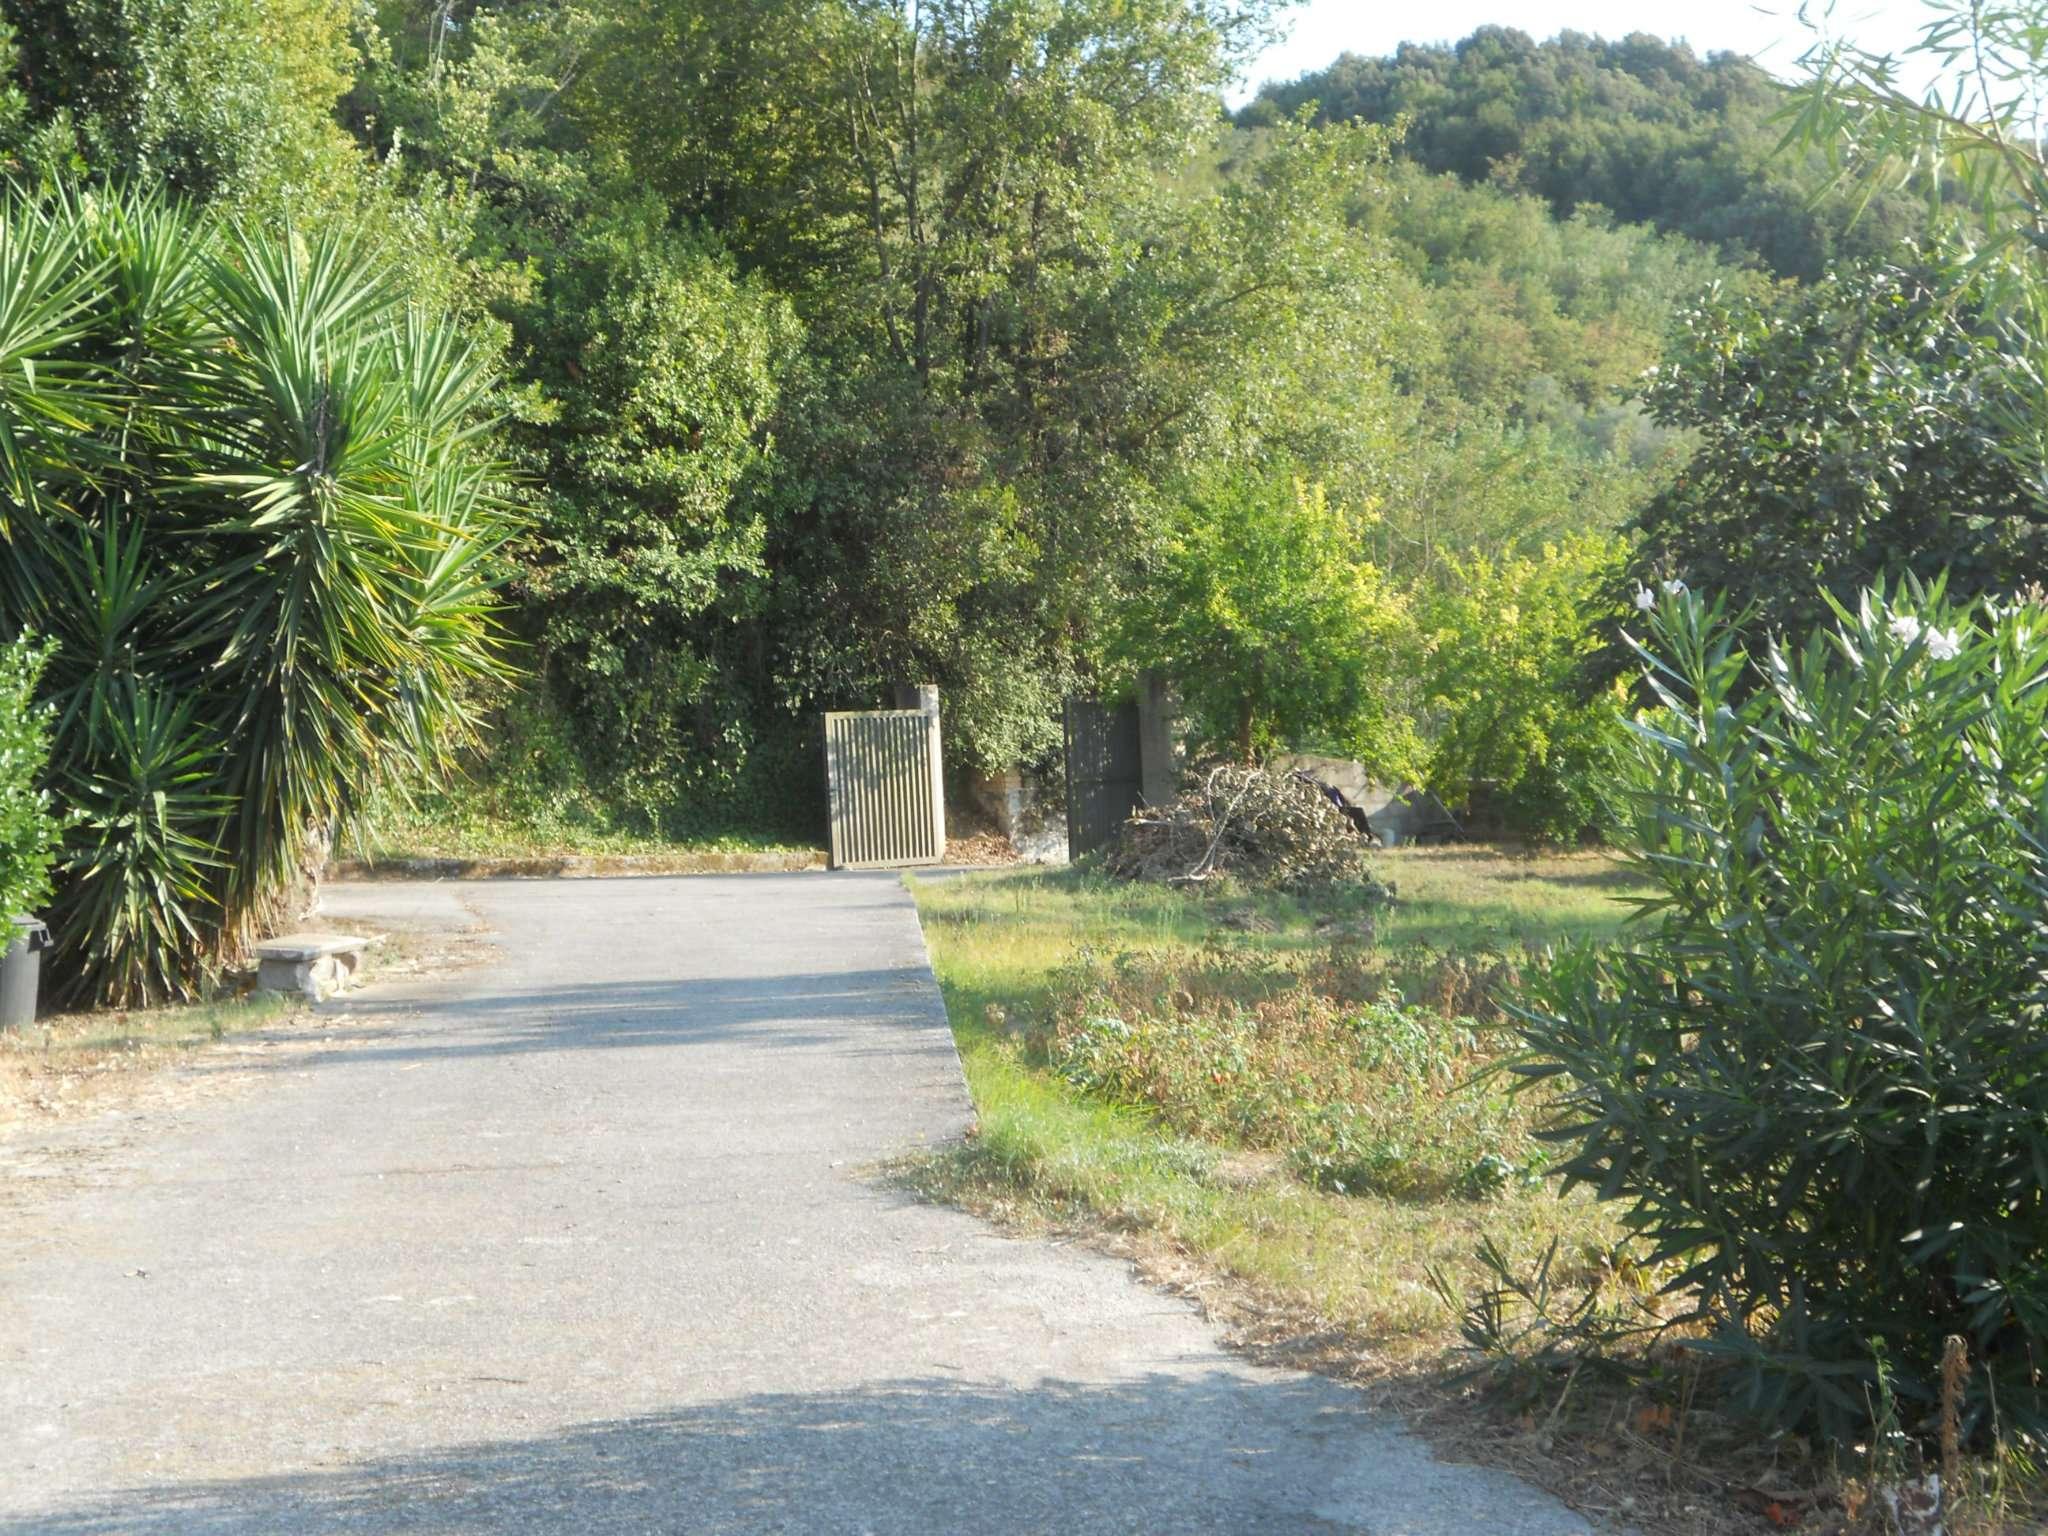 Attico / Mansarda in vendita a Sessa Aurunca, 10 locali, Trattative riservate | CambioCasa.it